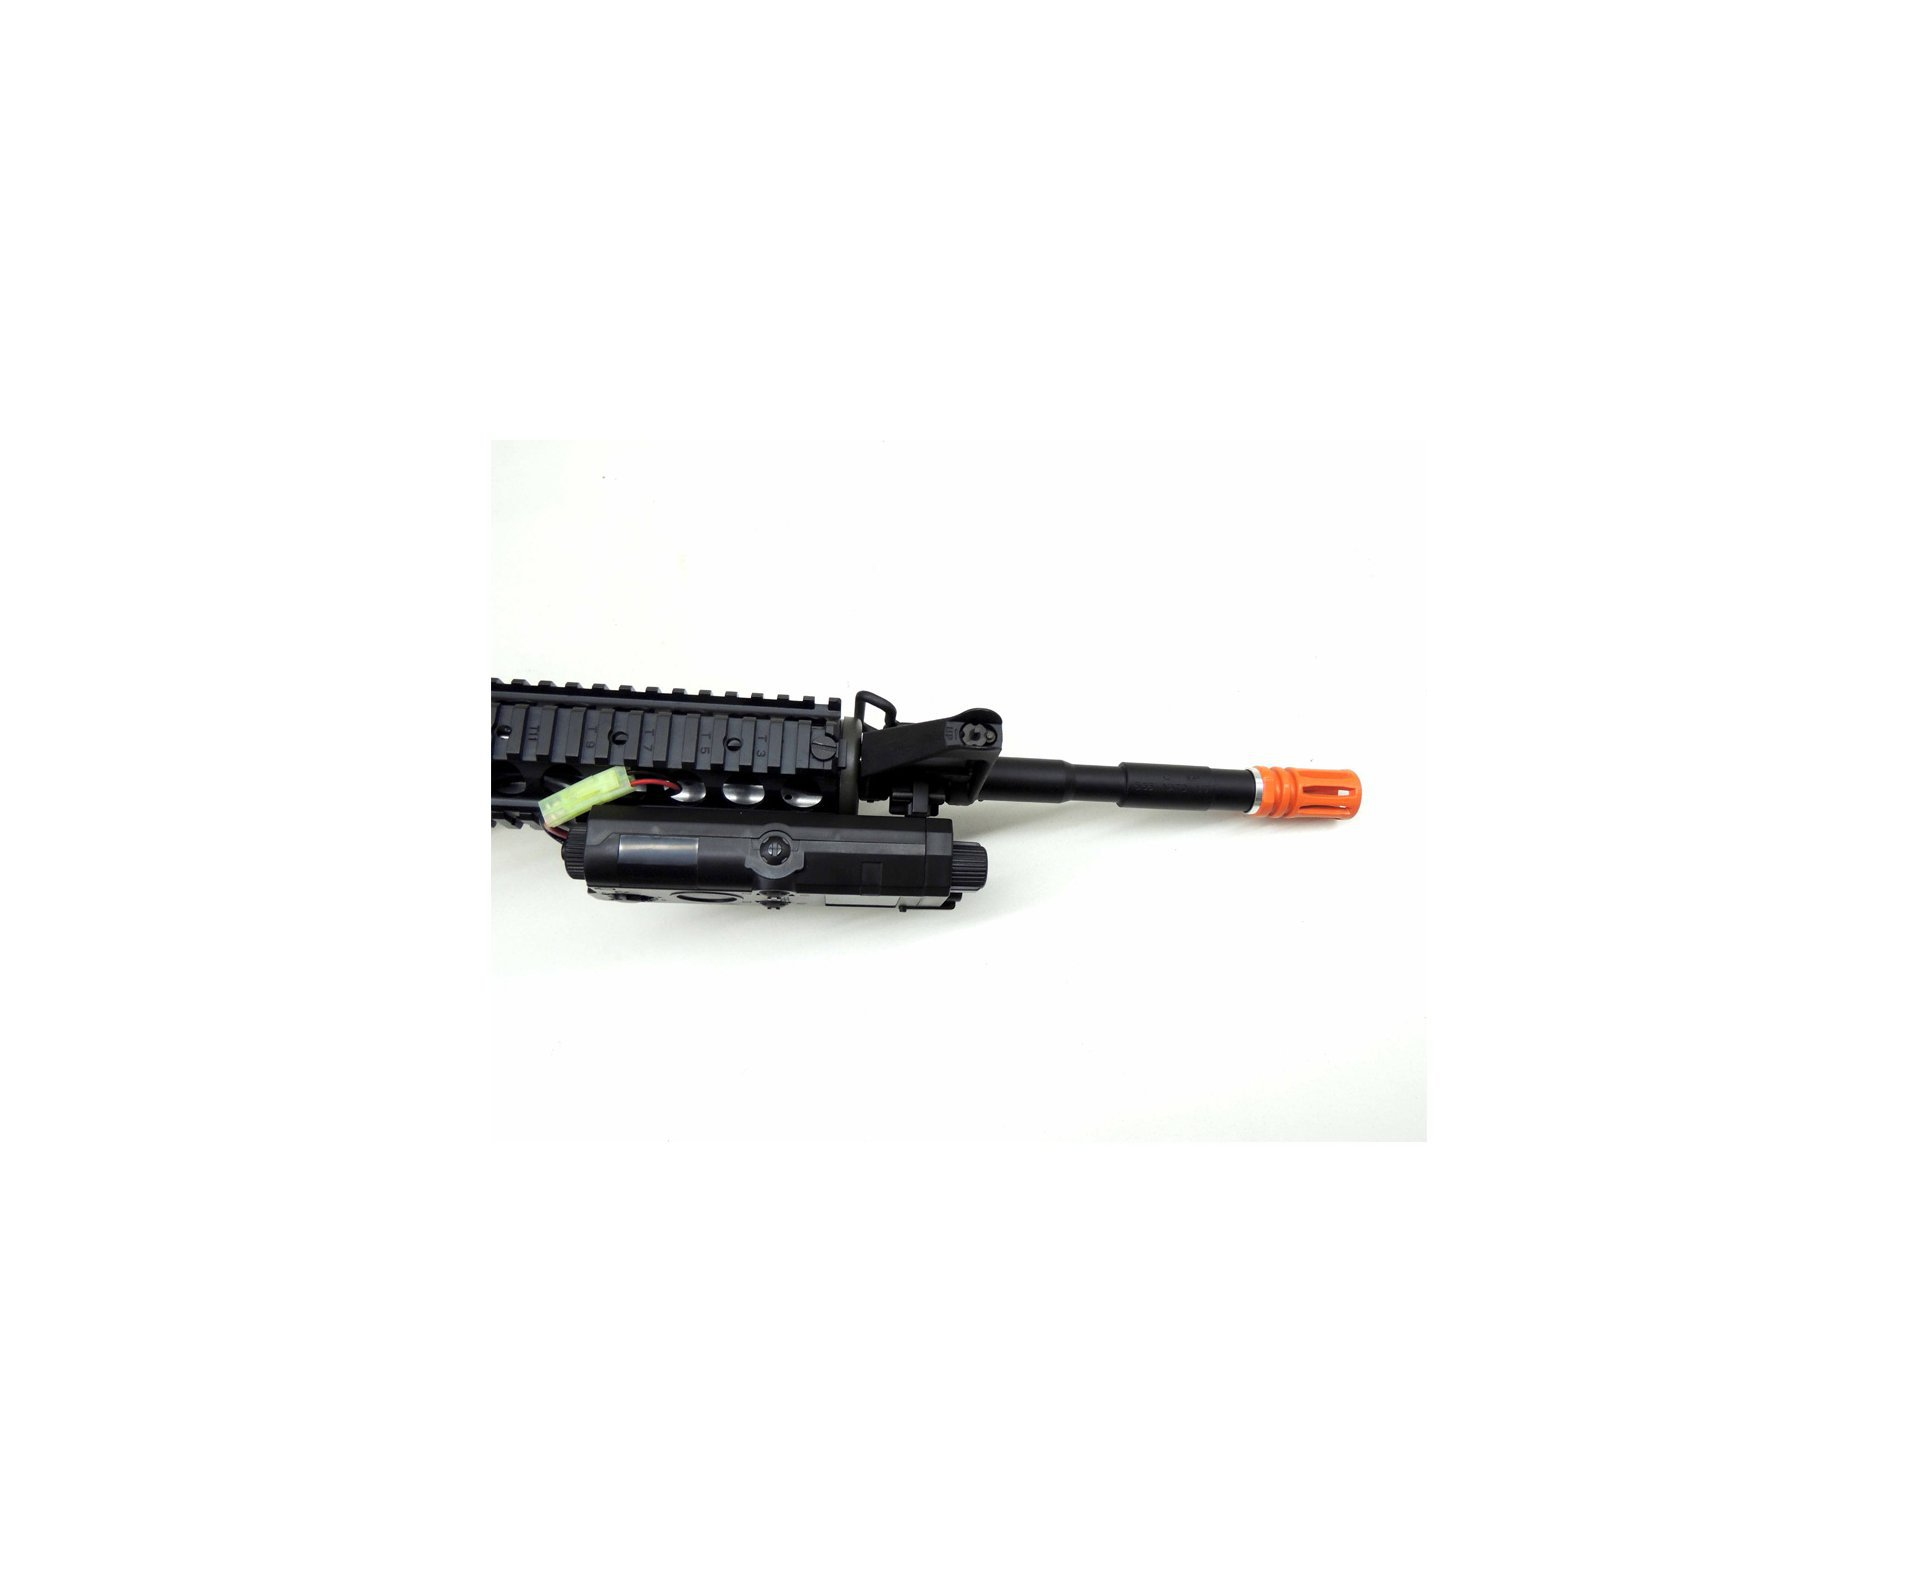 Rifle De Airsoft Col M4 Ris K.a Cal. 6mm + Red Dot 1x30 Rossi Elevada